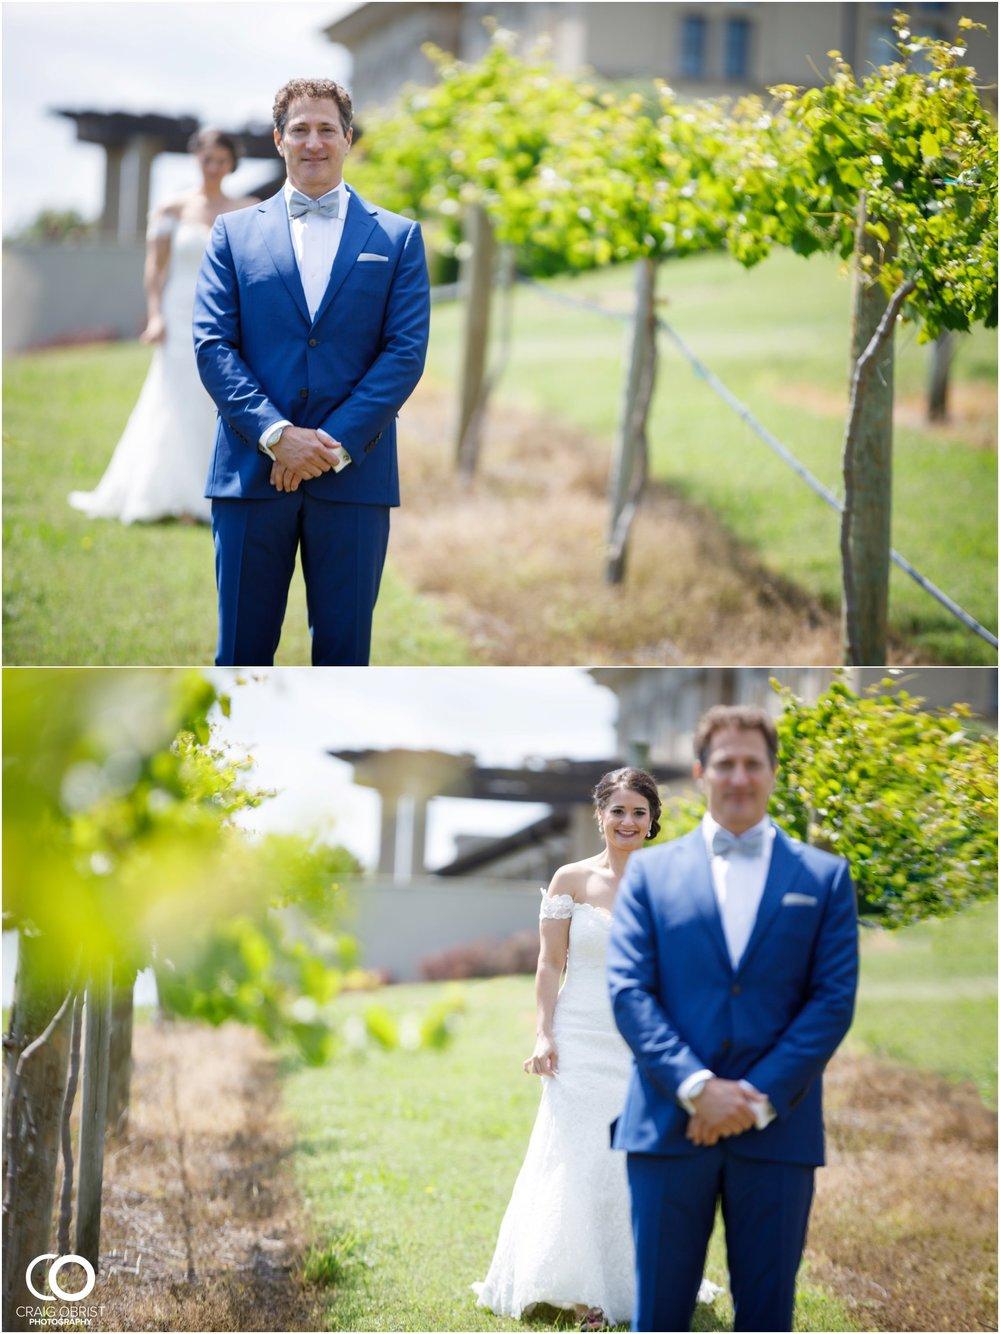 Chateau Elan Winery Wedding Portraits Luxury_0024.jpg